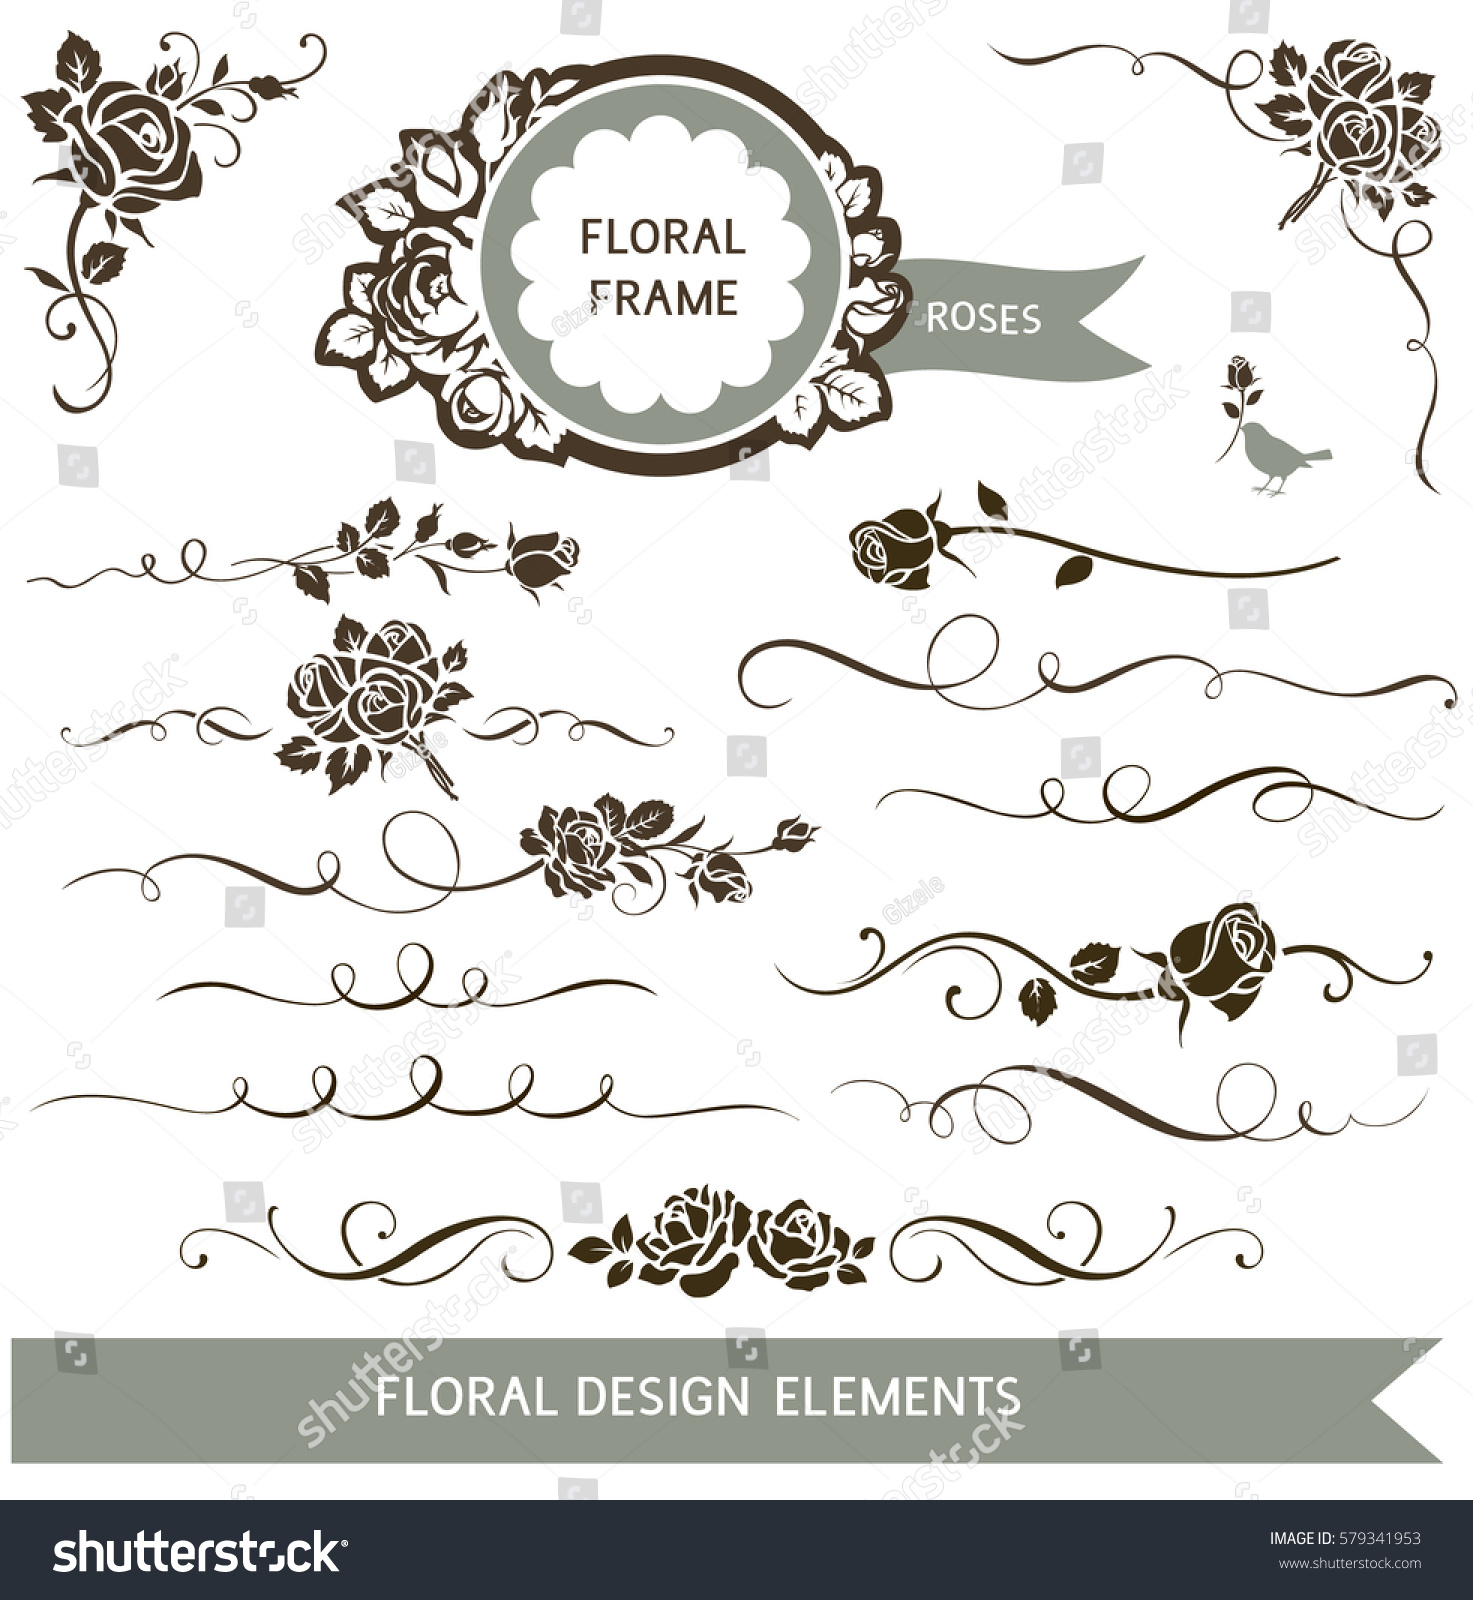 Set Of Black Flower Design Elements Stock Vector: Set Floral Calligraphic Design Elements Decorative Stock